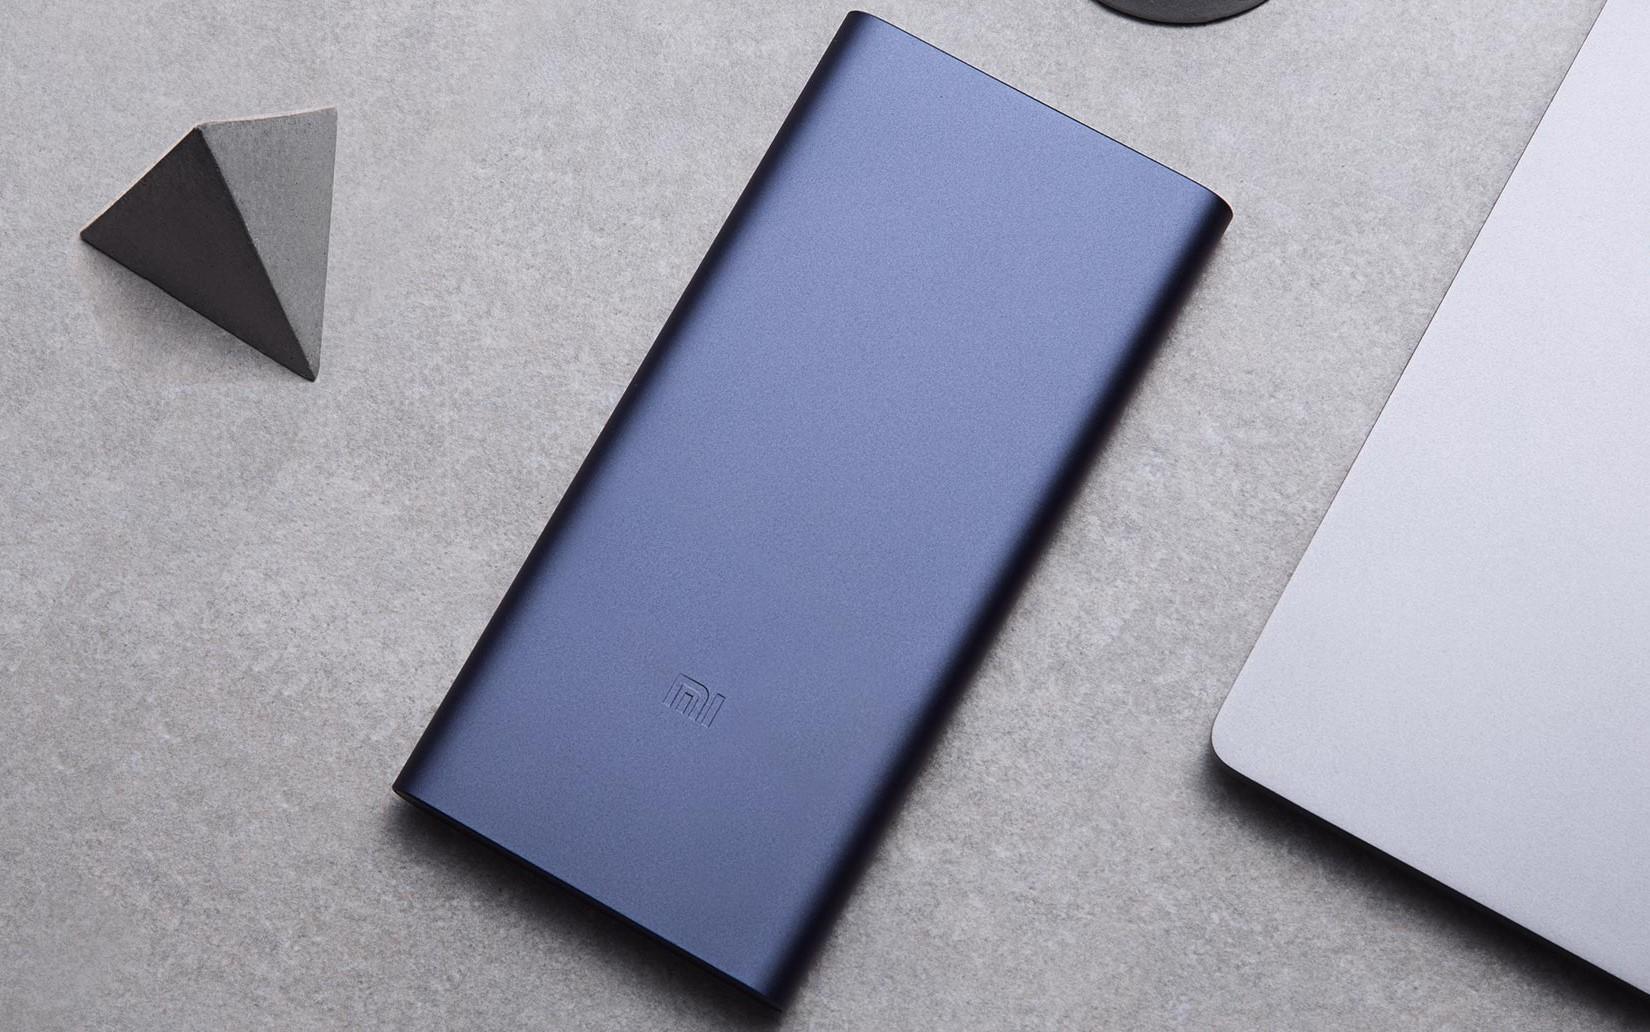 Pin sạc dự phòng Xiaomi Mi 2S 10000mAh (Bạc)